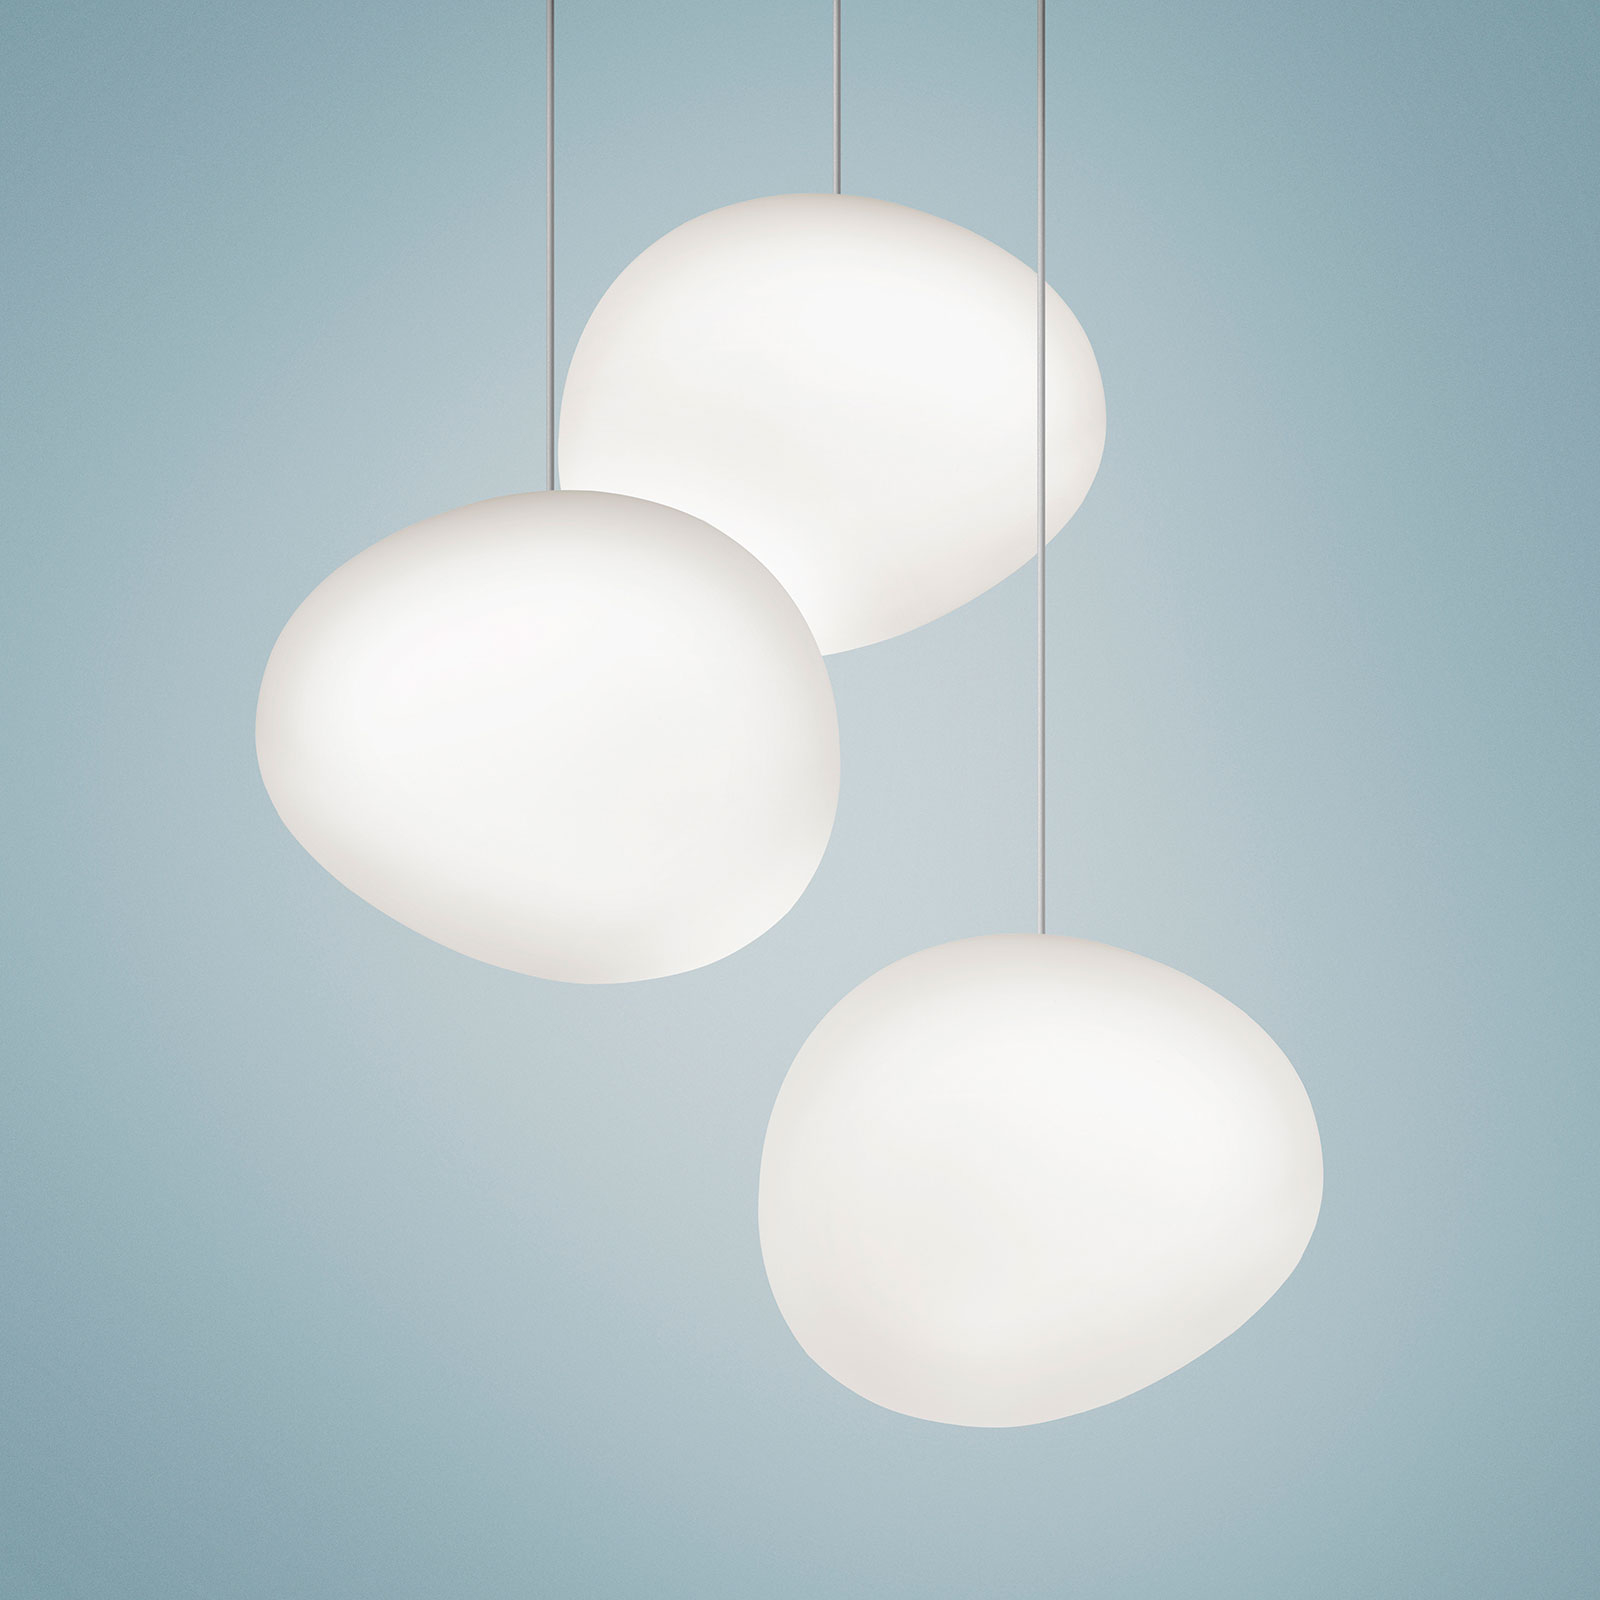 Foscarini Gregg LED glass hengelampe, dimbar   Lampegiganten.no